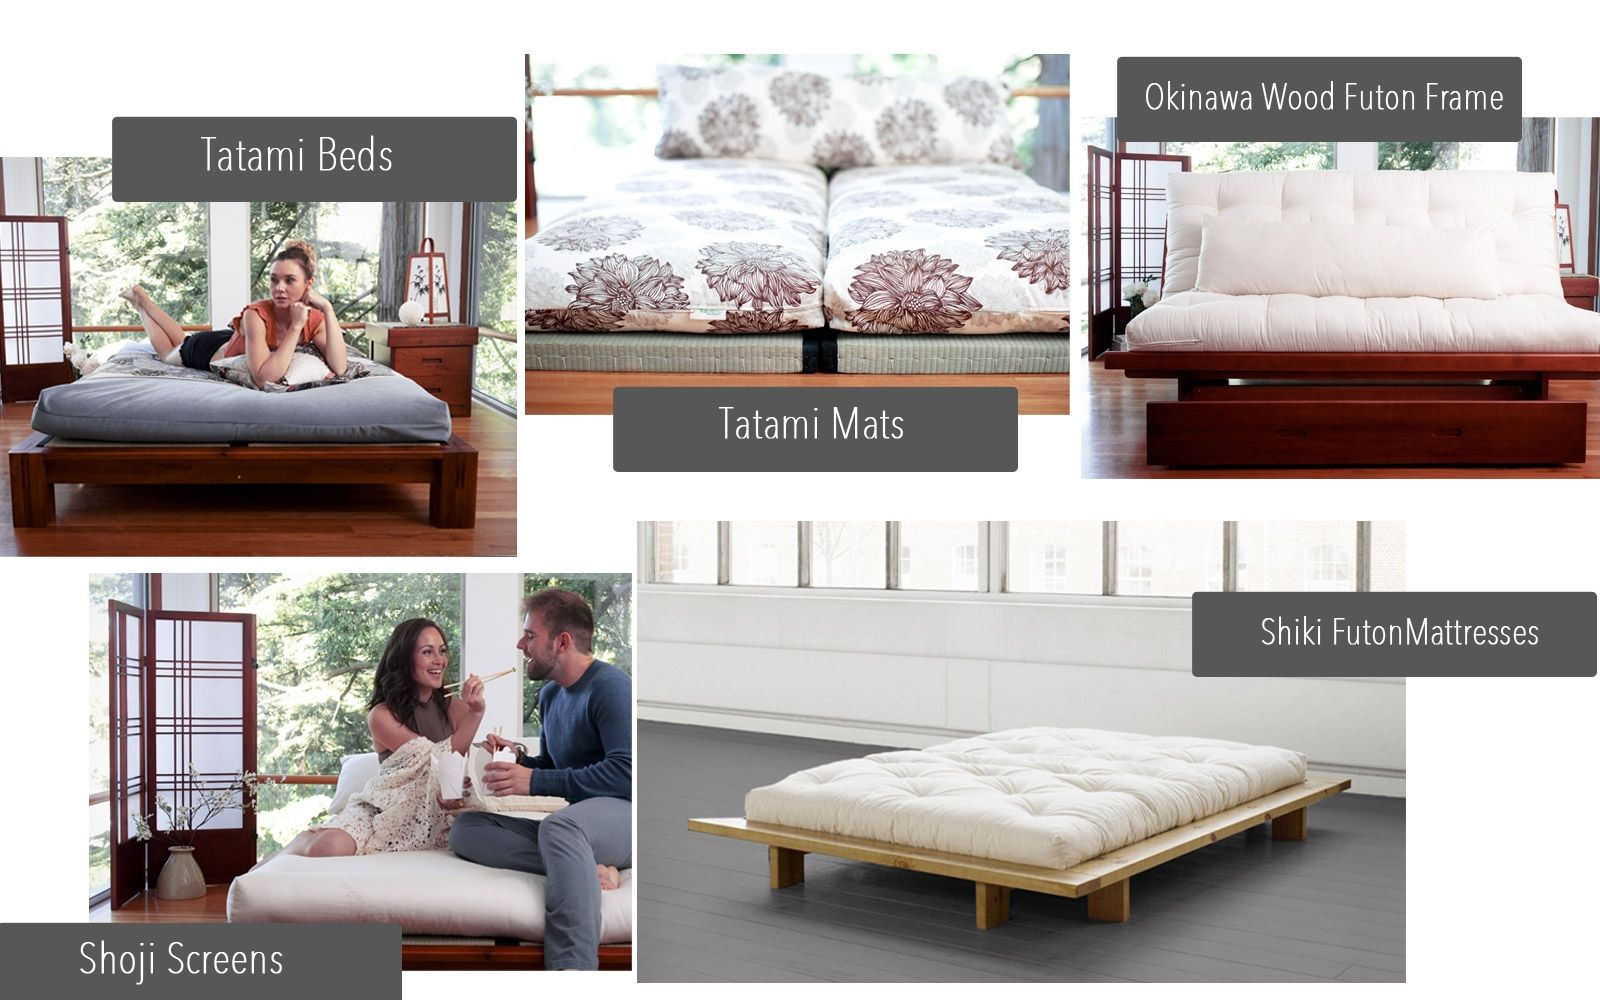 Japanese Furniture The Futon